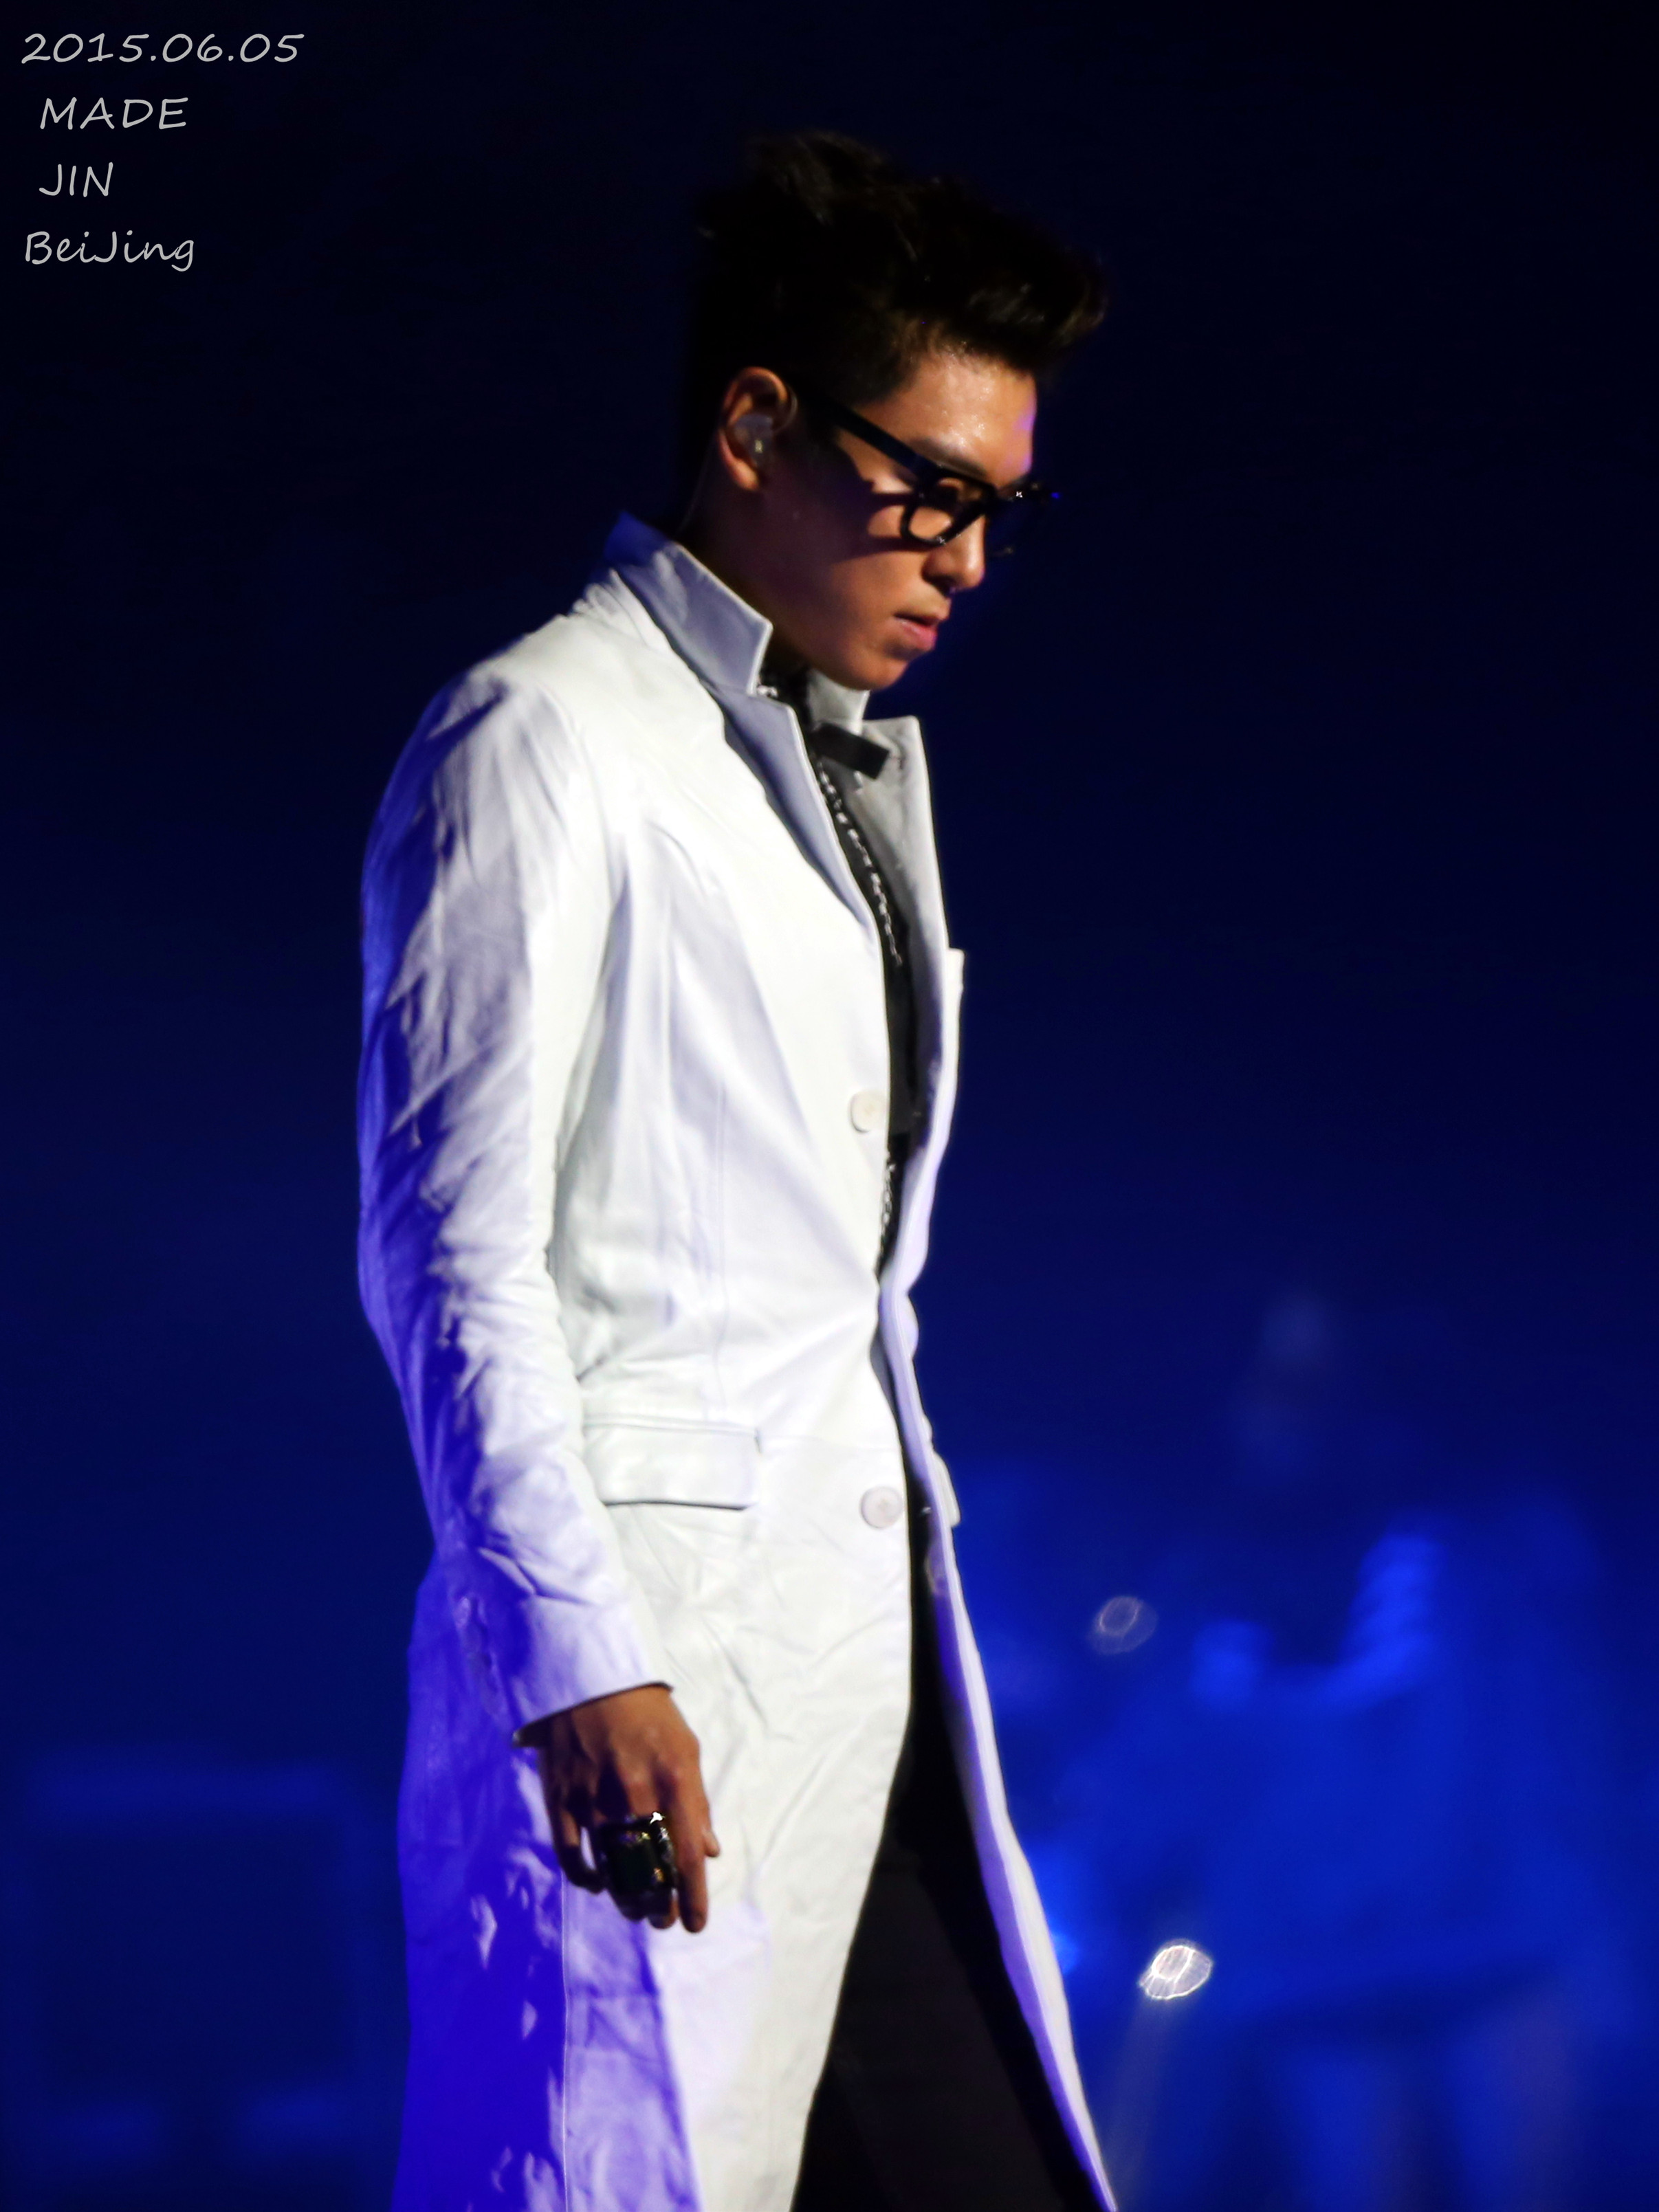 BIGBANG - Made Tour 2015 - Beijing - 05jun2015 - G-Jin - 11.jpg